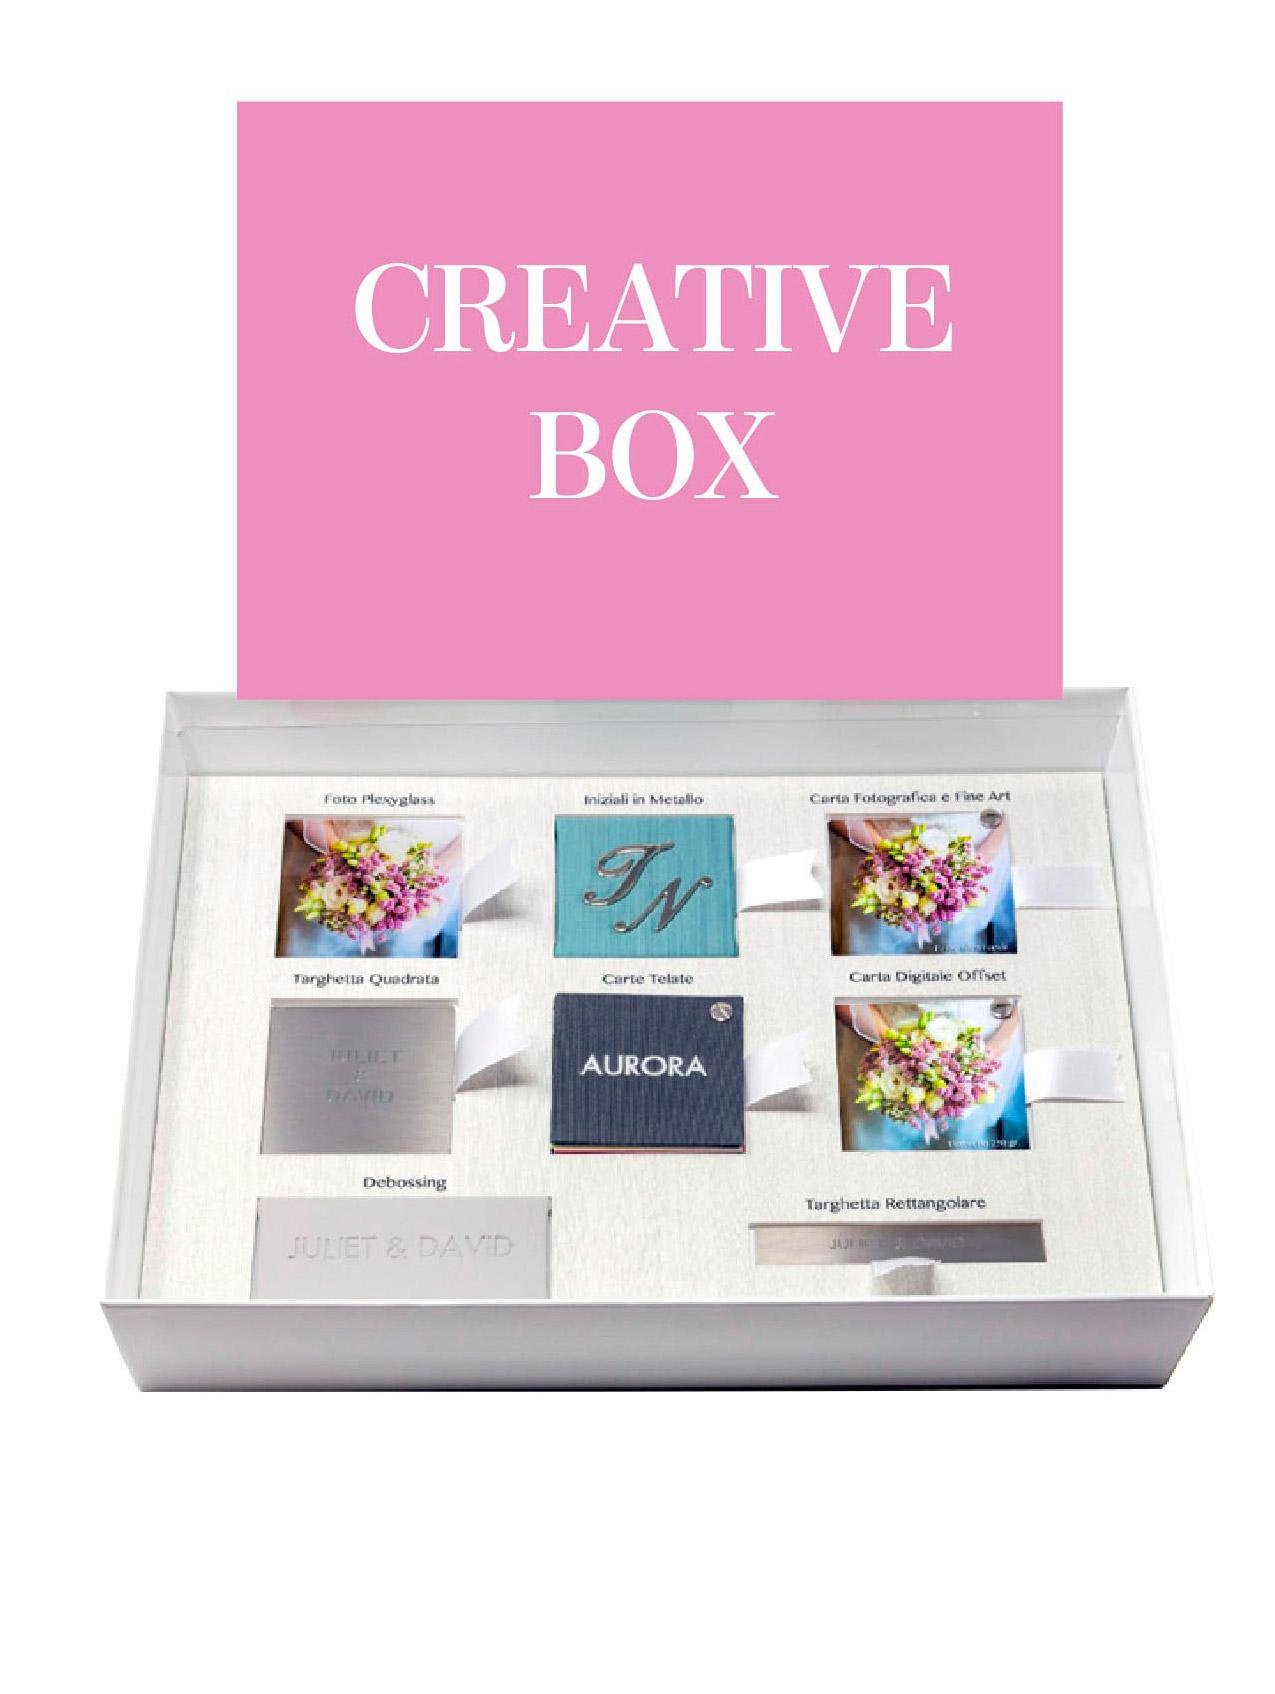 creativebox_aurorabook